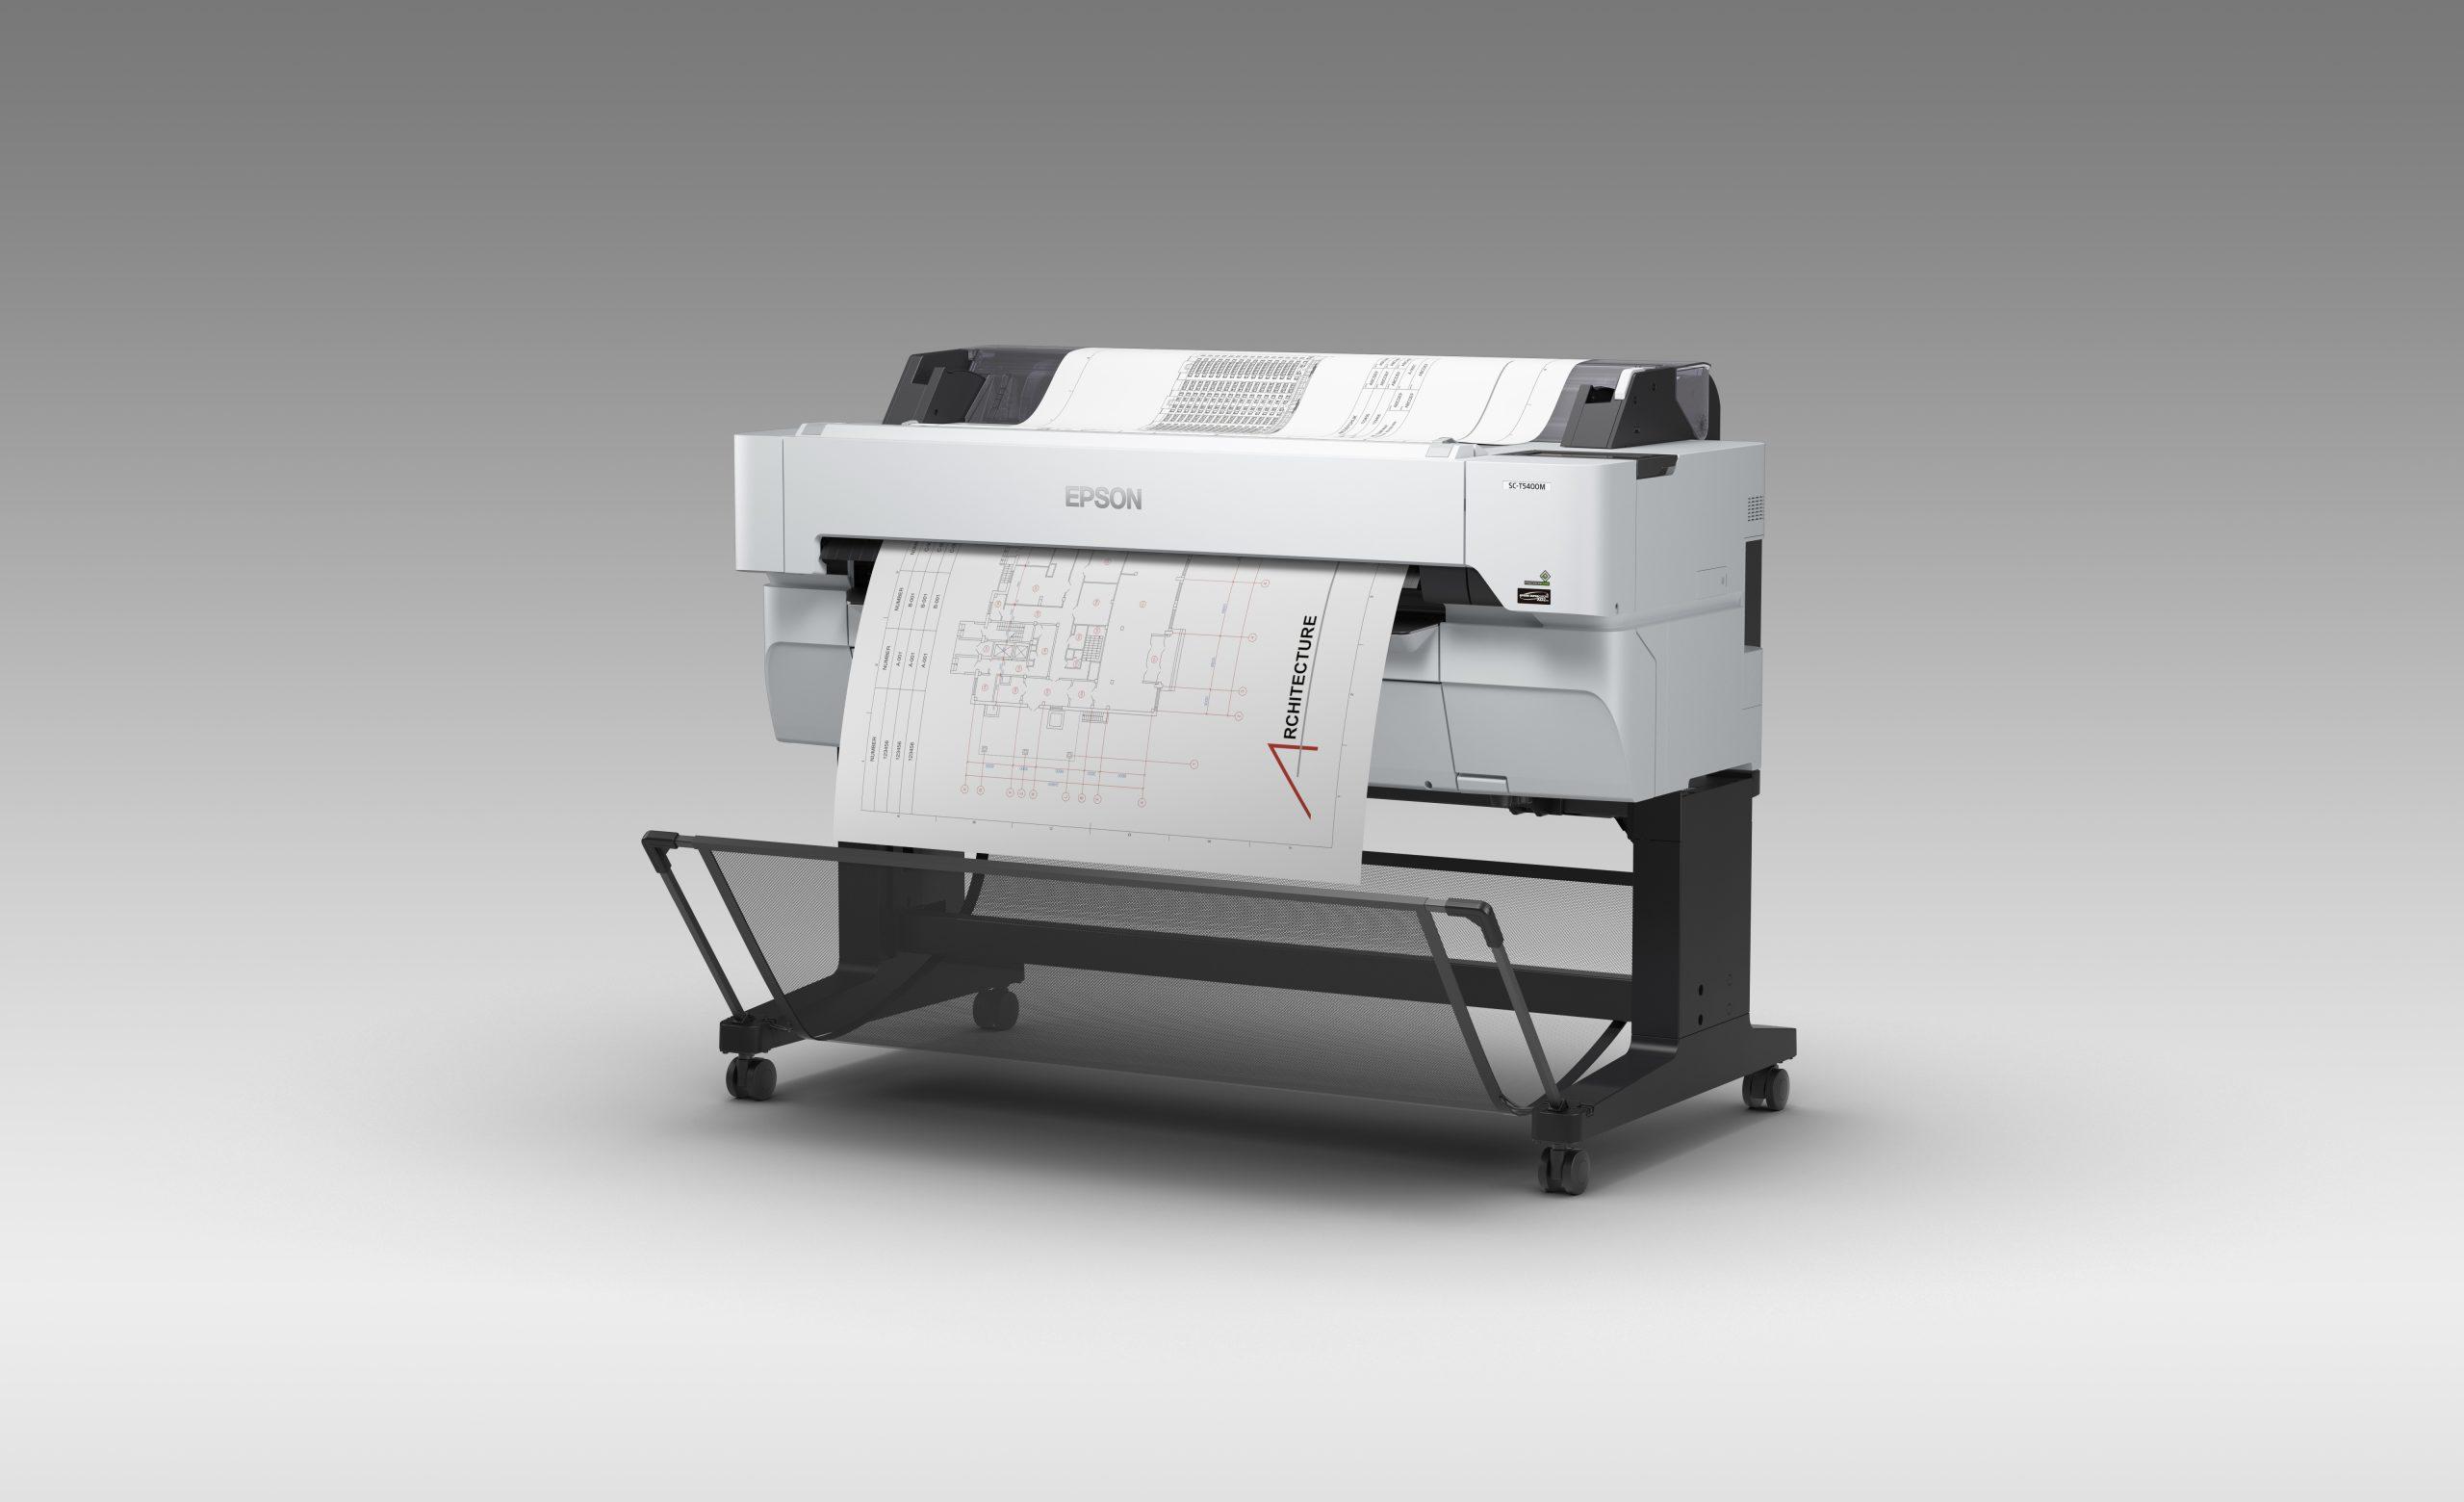 EPSON SC-T5400